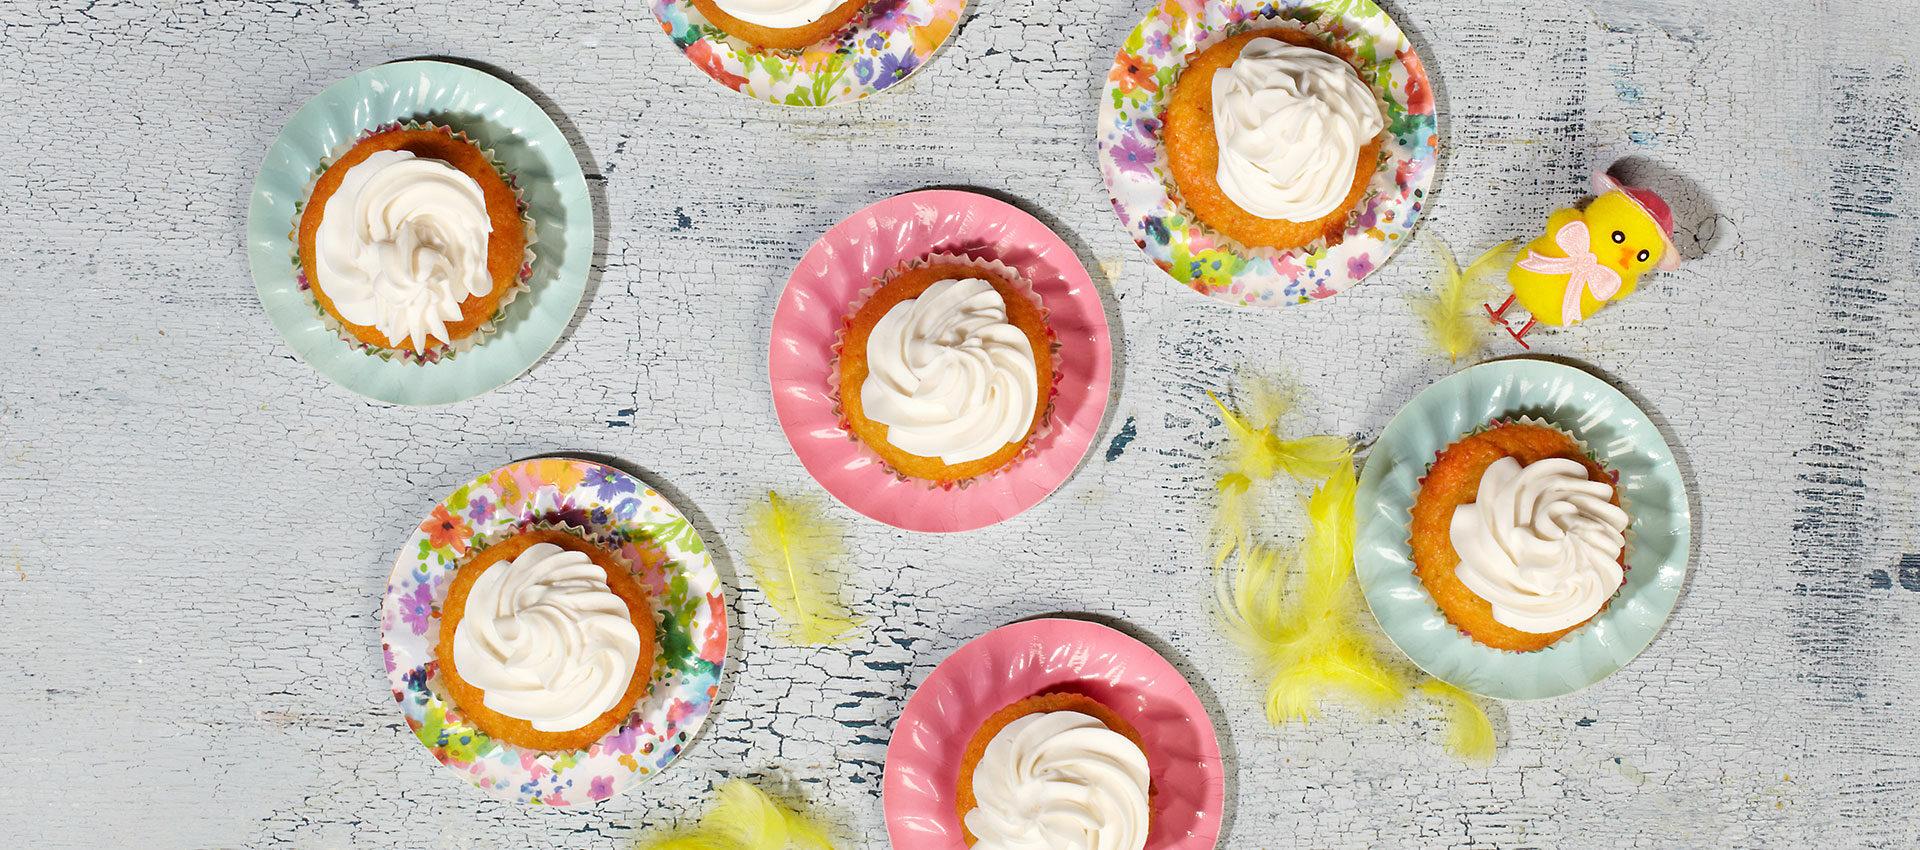 Vegan Pumpkin Muffins with Violife Cream Cheese Original